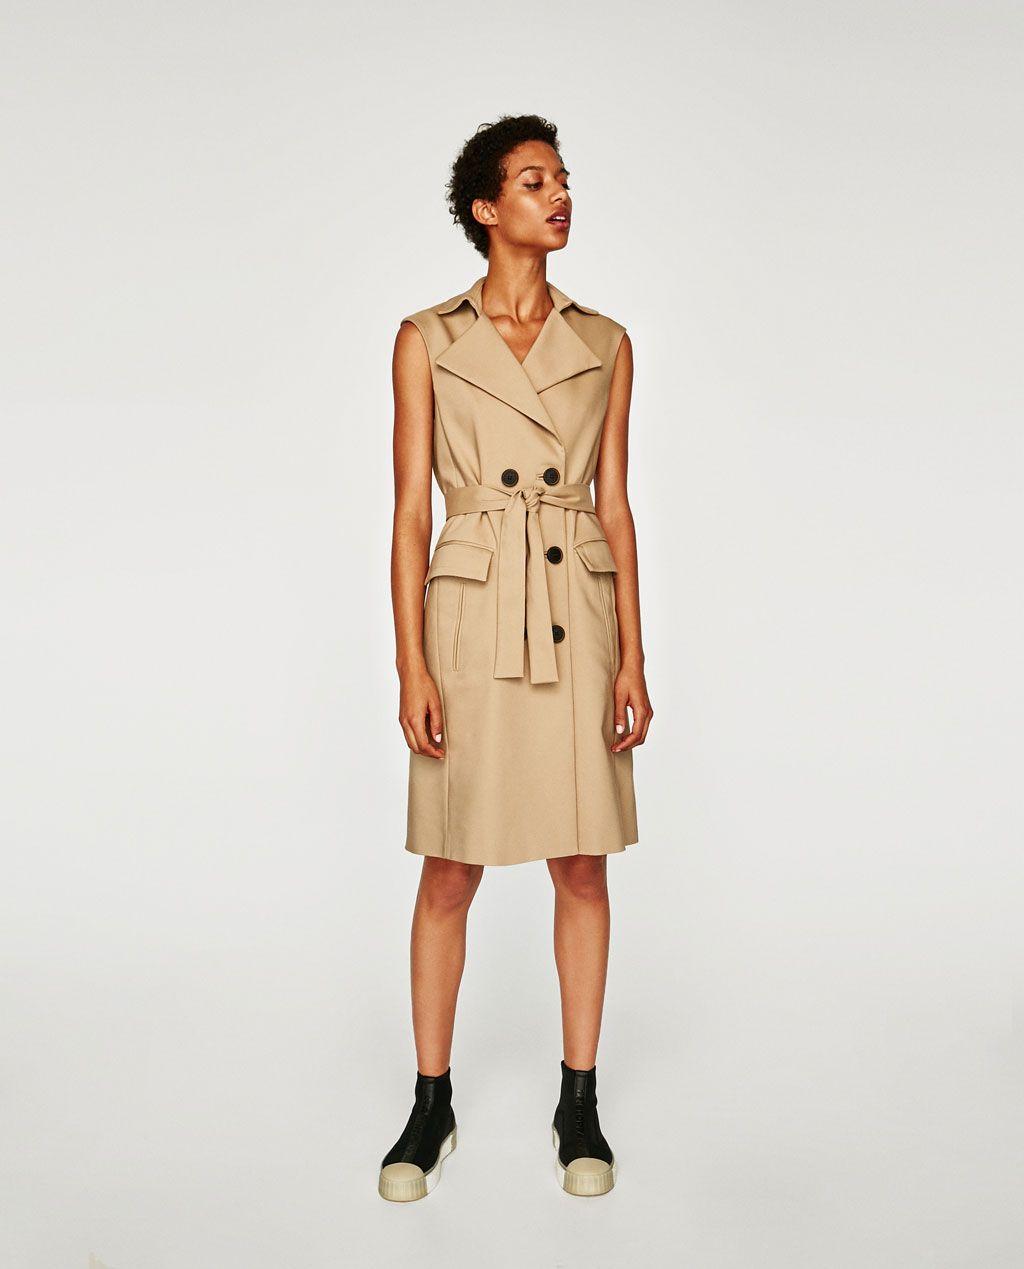 CHALECO VESTIDO DOBLE BOTONADURA  Beige dress outfit, Waistcoat